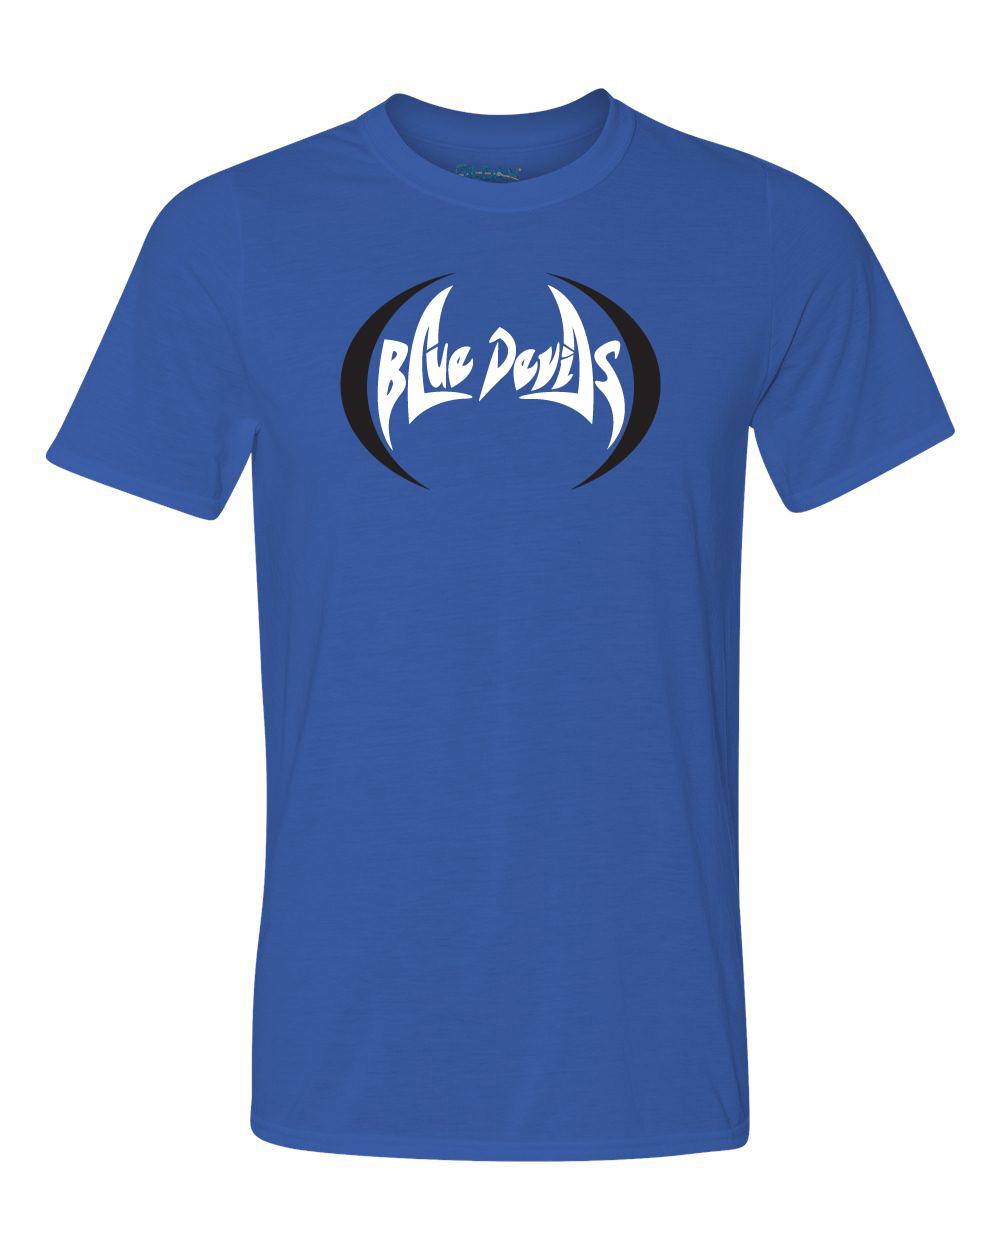 Shirt Design Sharpsville